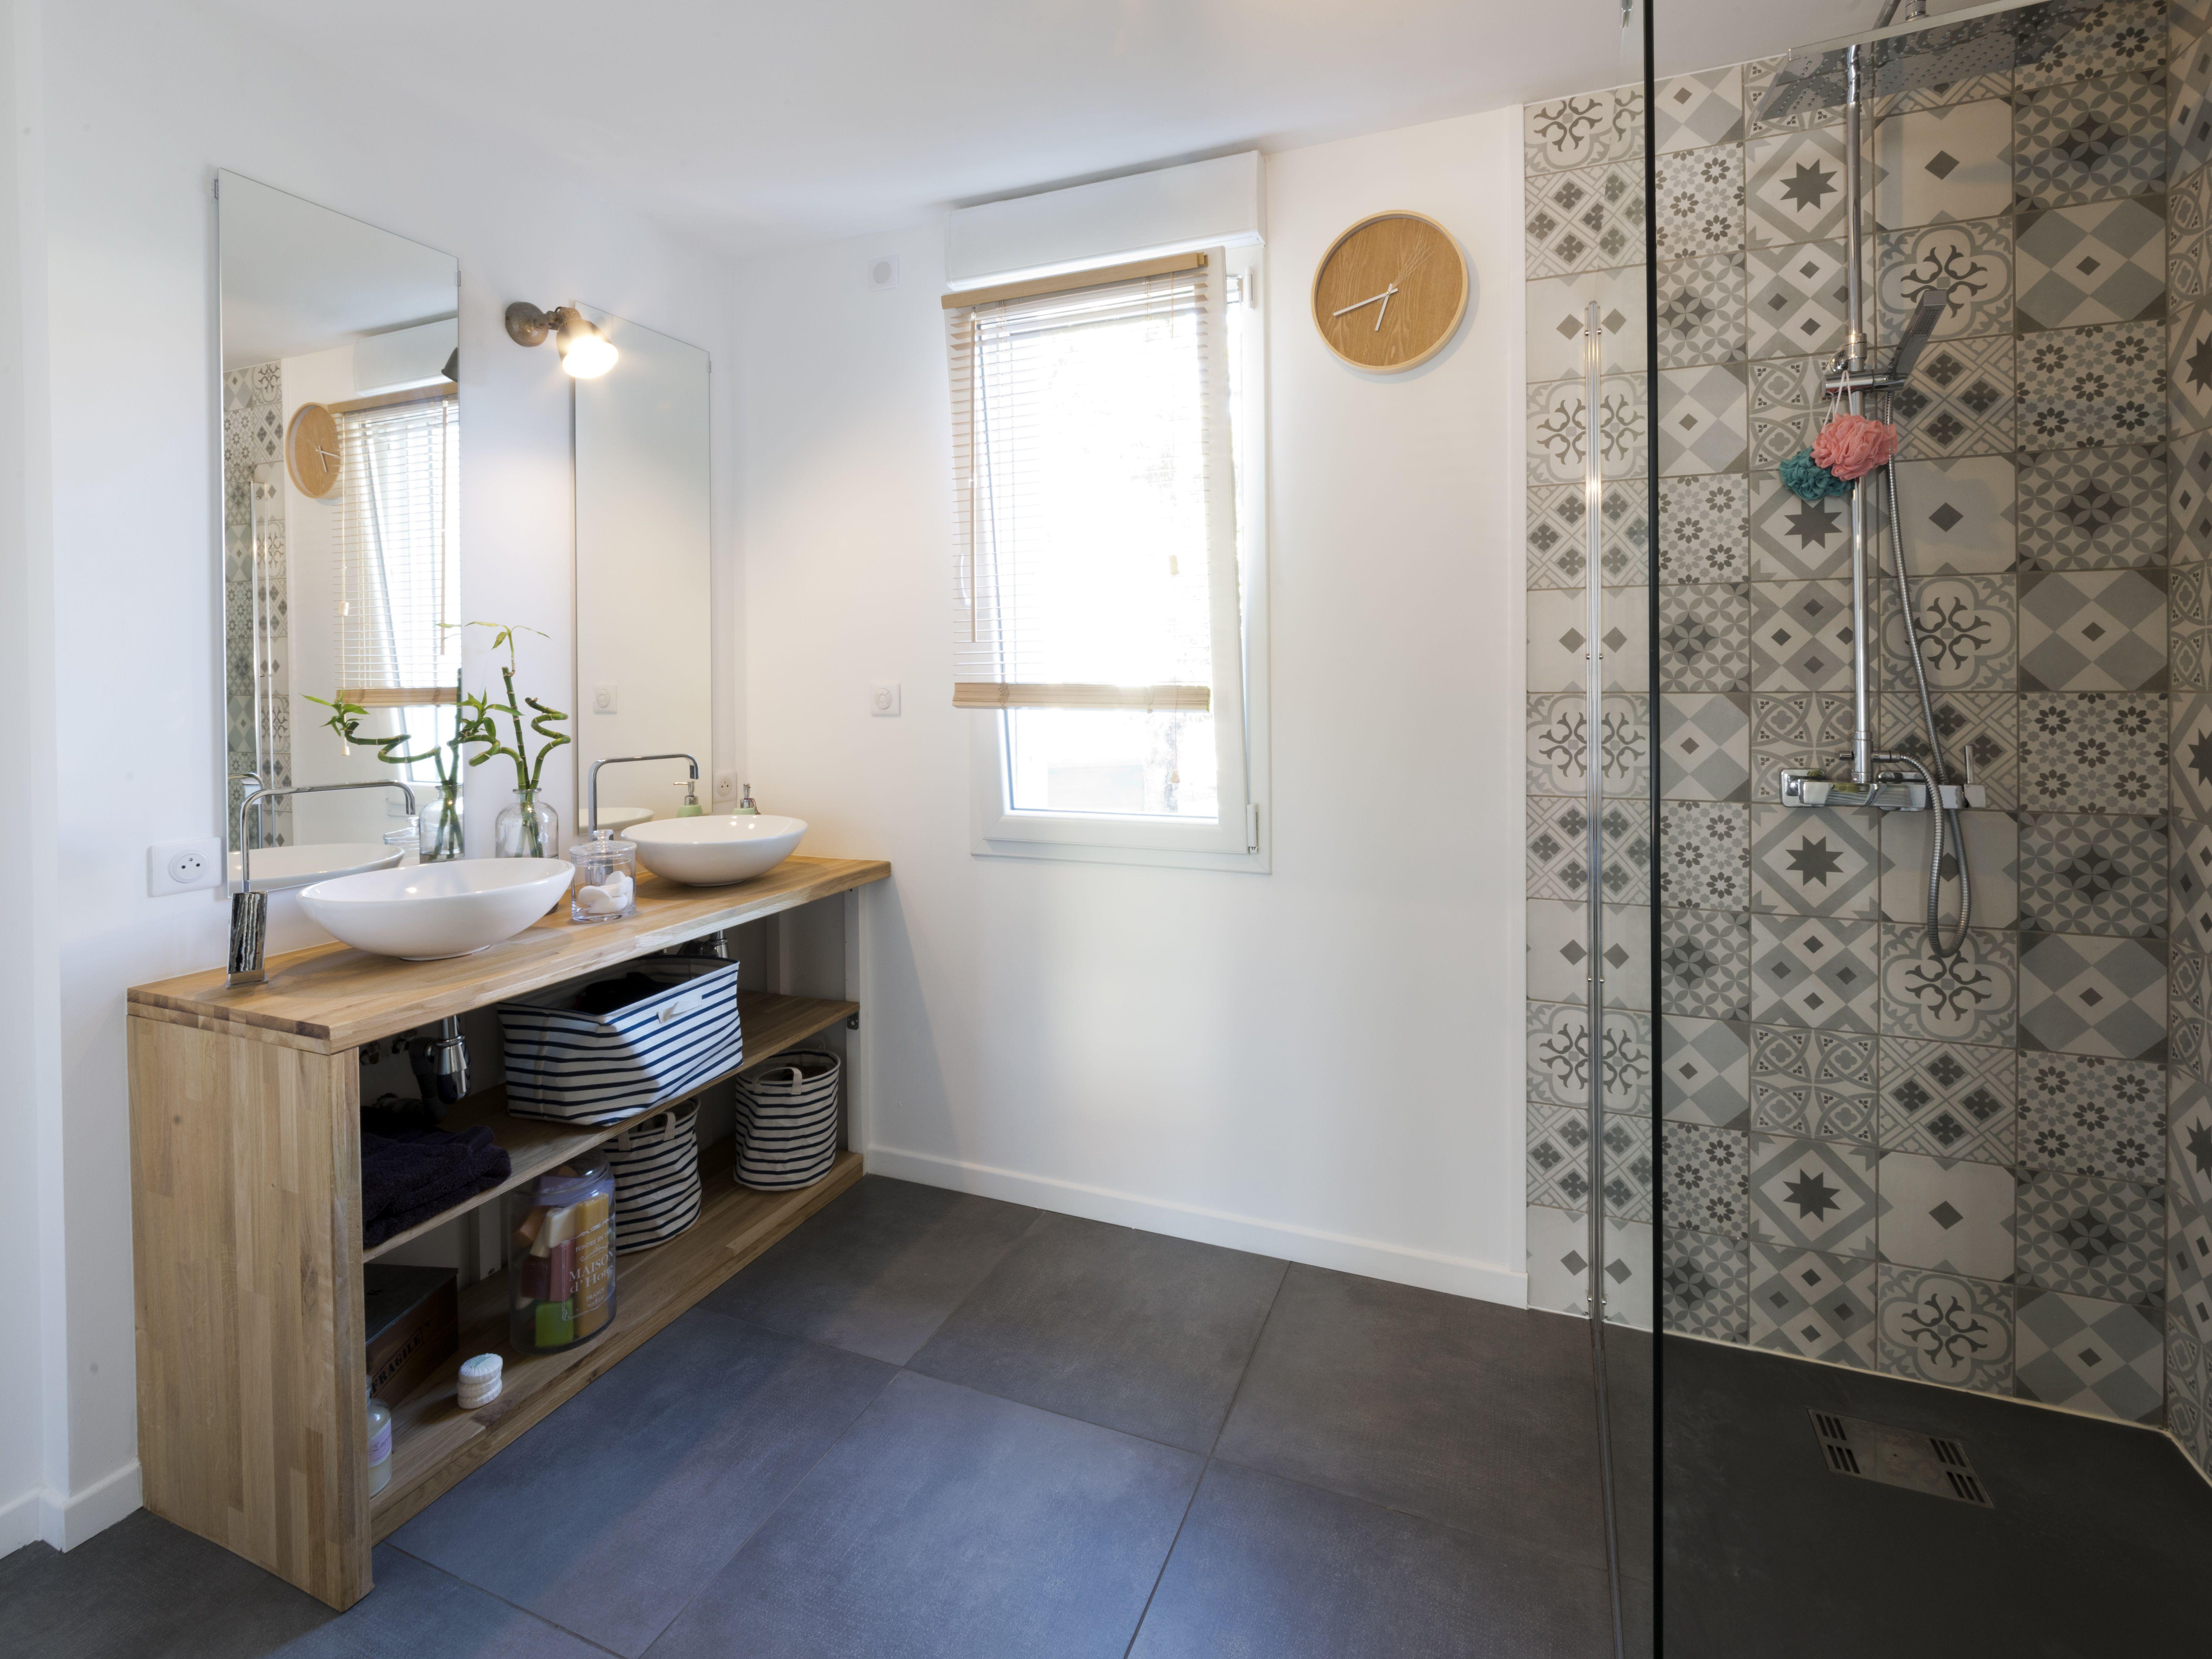 leroy merlin salle de bain douche italienne maison design. Black Bedroom Furniture Sets. Home Design Ideas